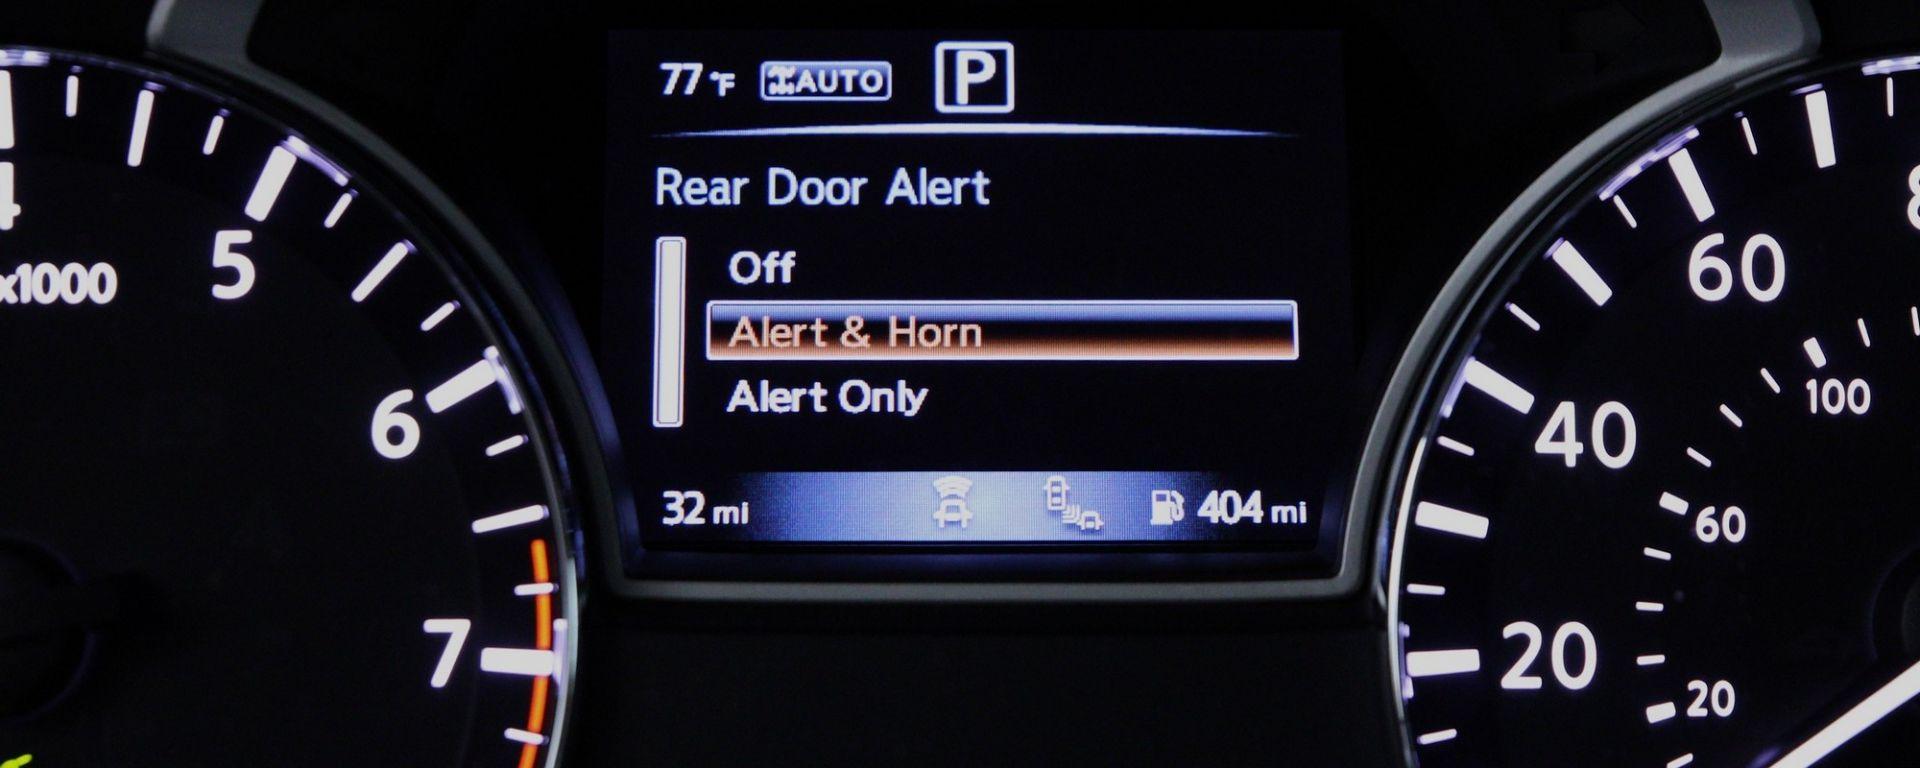 Nissan Rear Door Alert: le tre possibili impostazioni